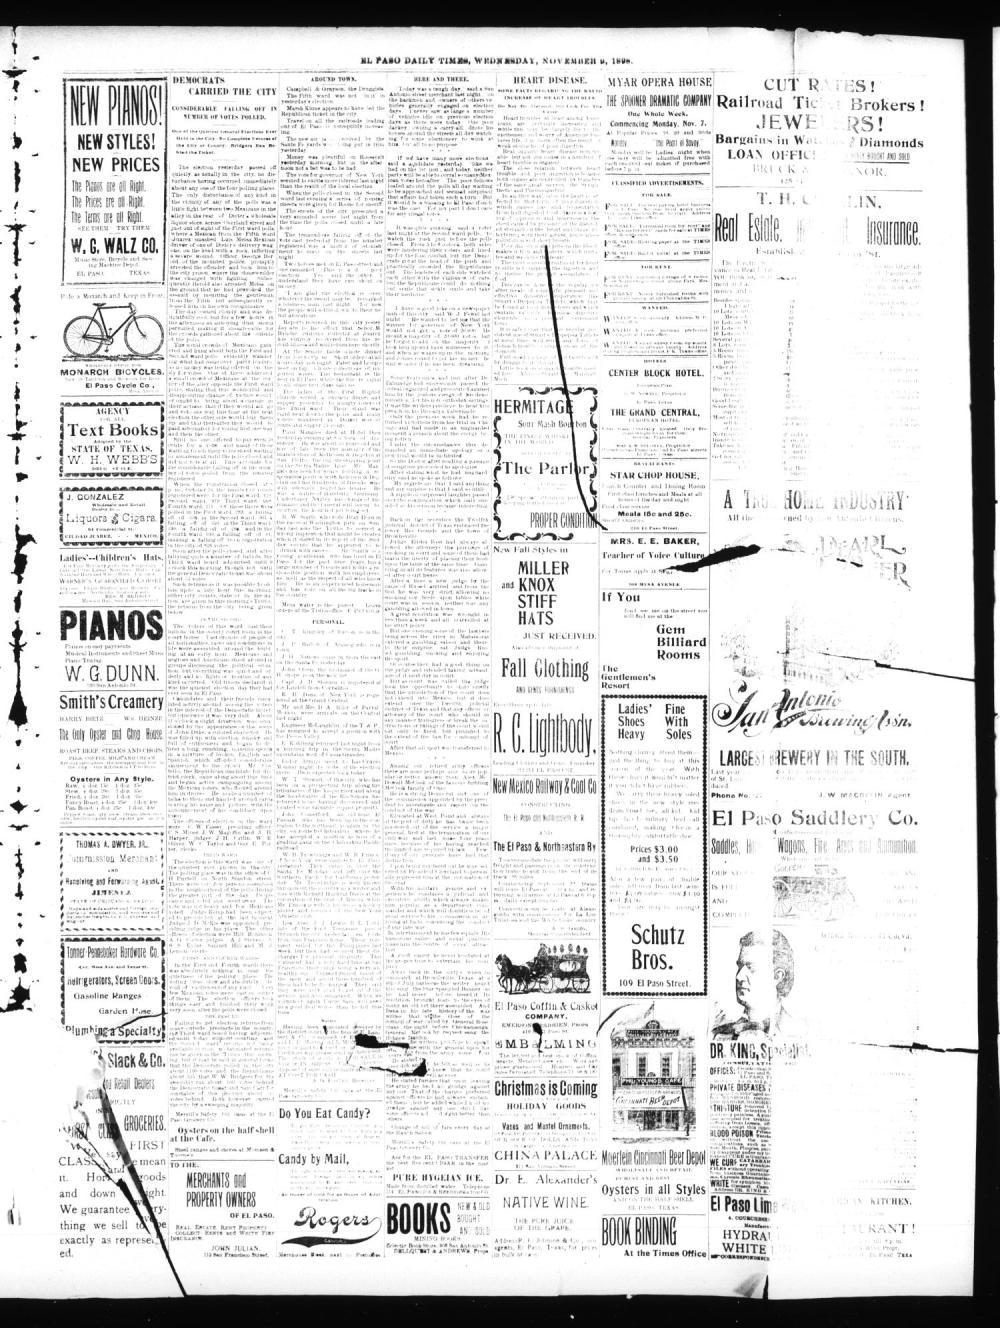 medium resolution of el paso international daily times el paso tex vol 18 no 268 ed 1 wednesday november 9 1898 page 3 of 4 the portal to texas history